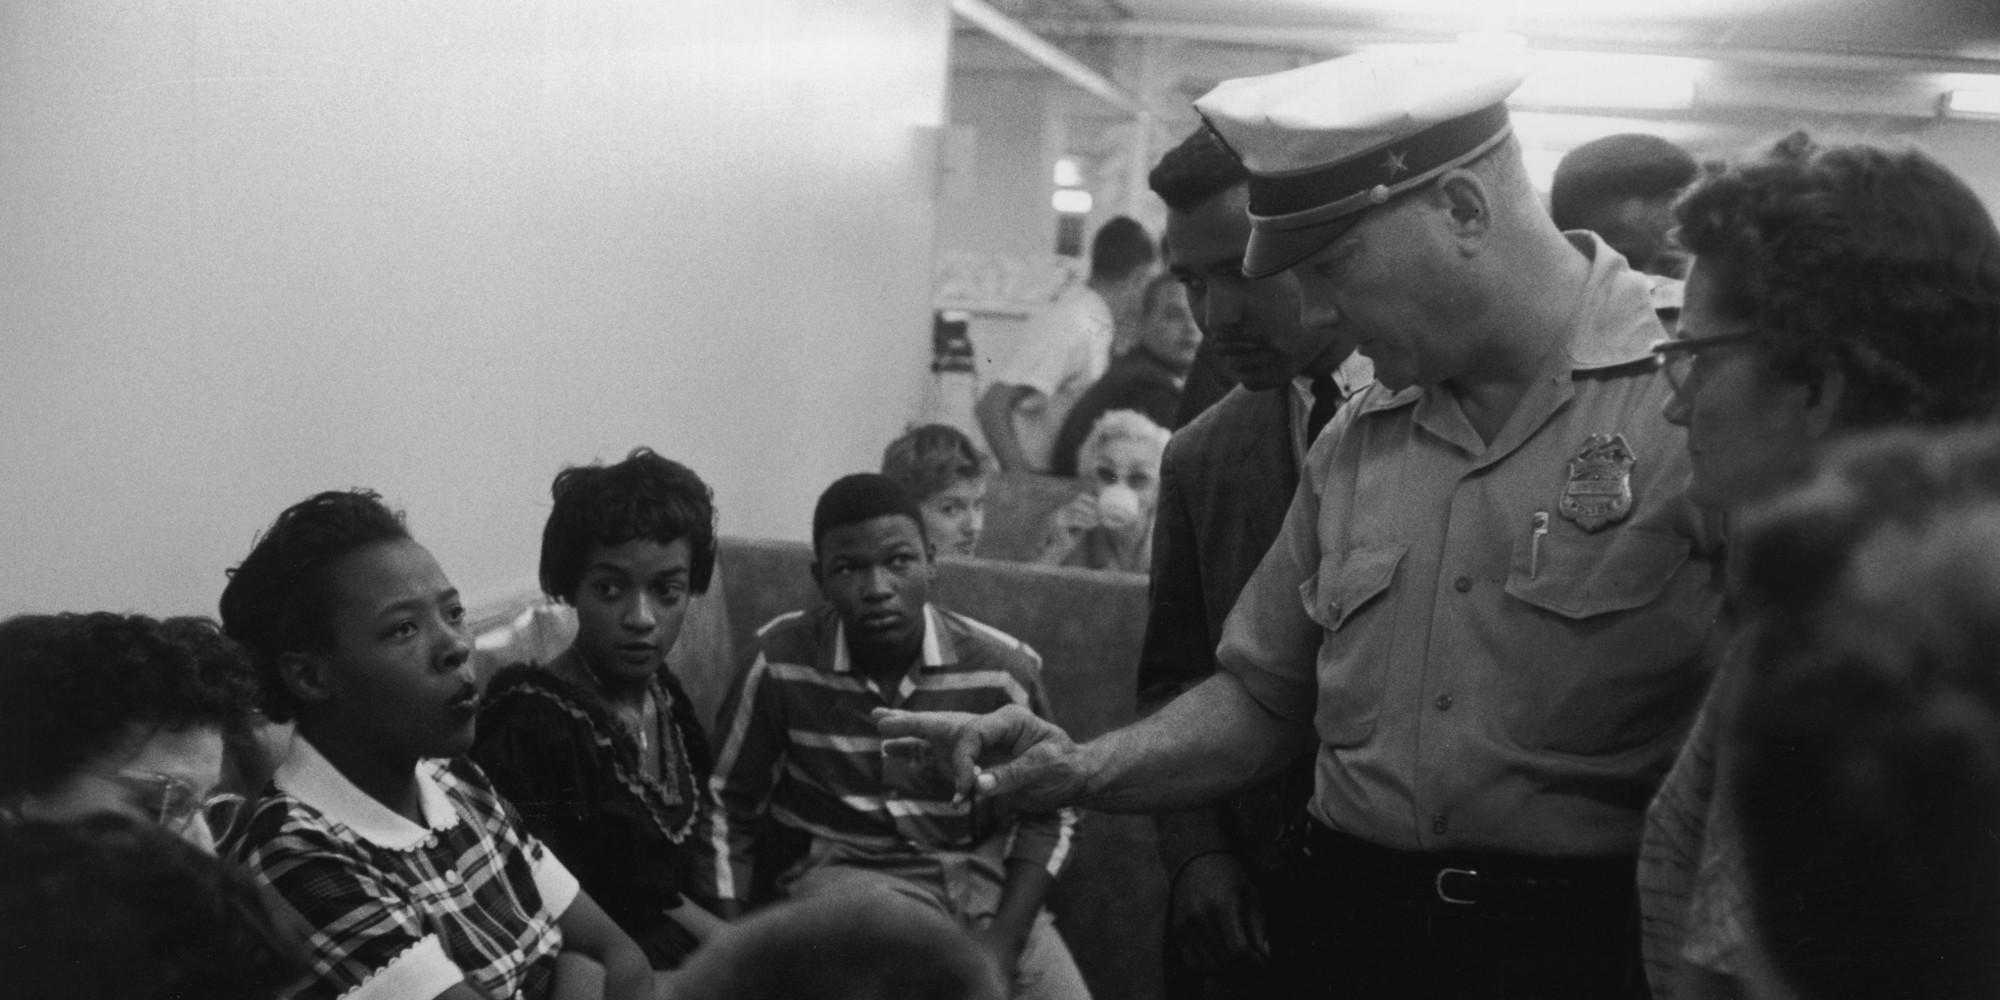 Civil Rights Sit Ins Helped Desegregate Restaurants